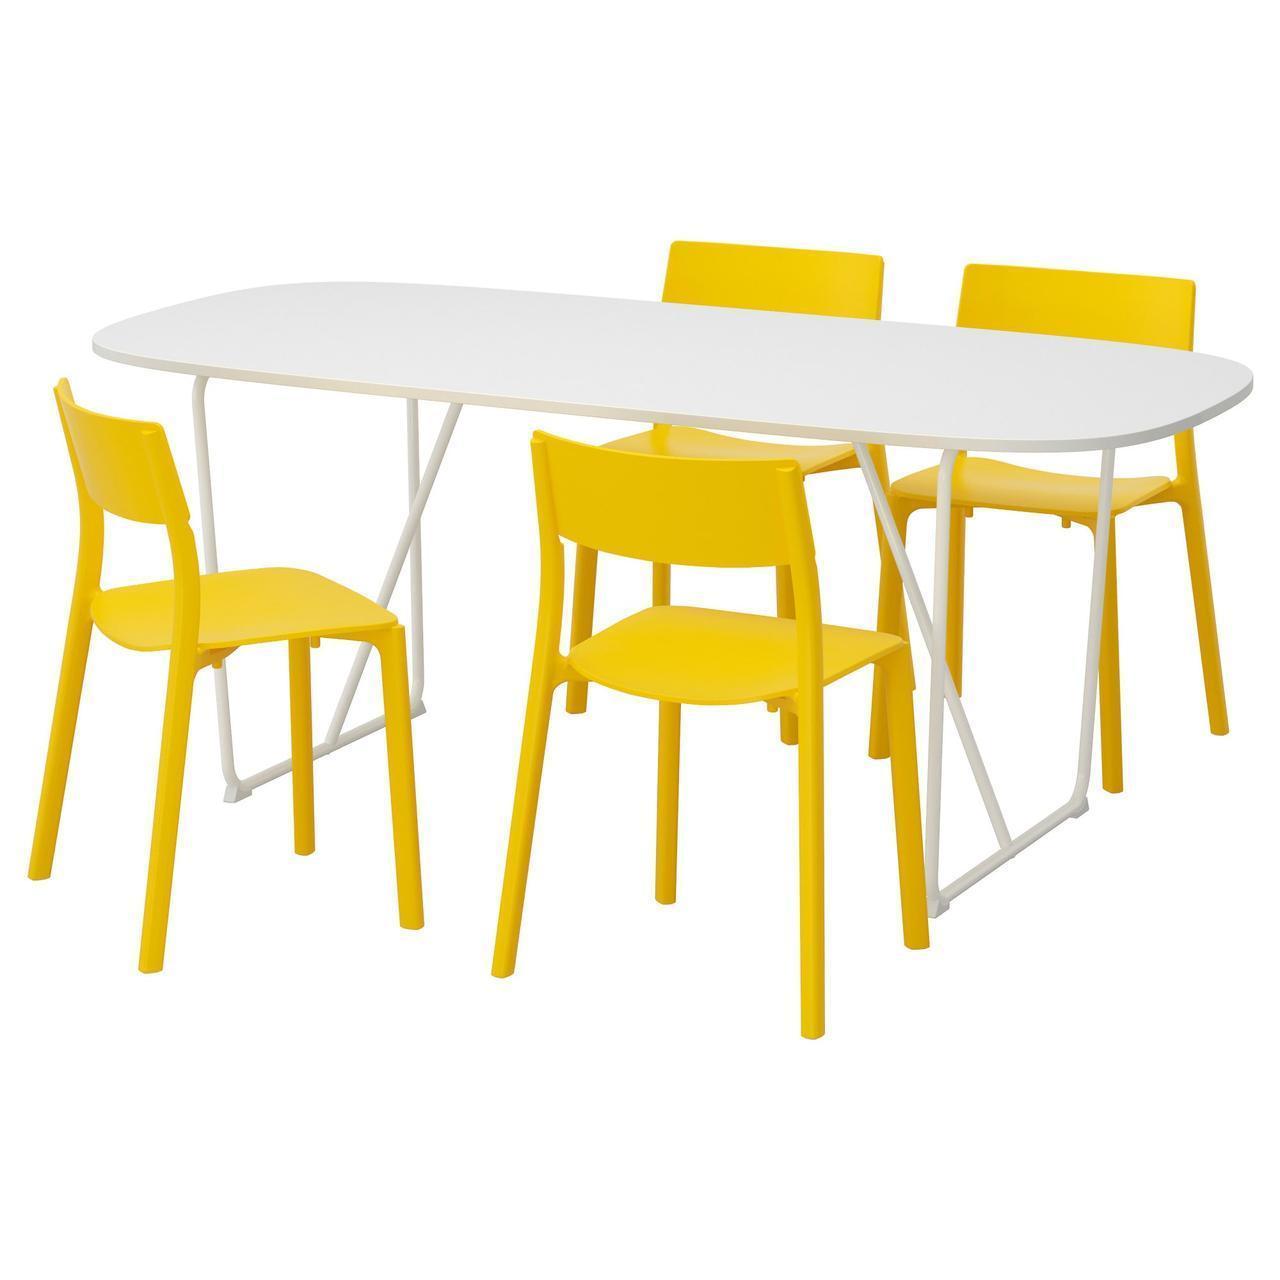 Комплект для кухни (стол и 4 стула) IKEA OPPEBY / BACKARYD / JANINGE 185 см белый желтый 692.298.25